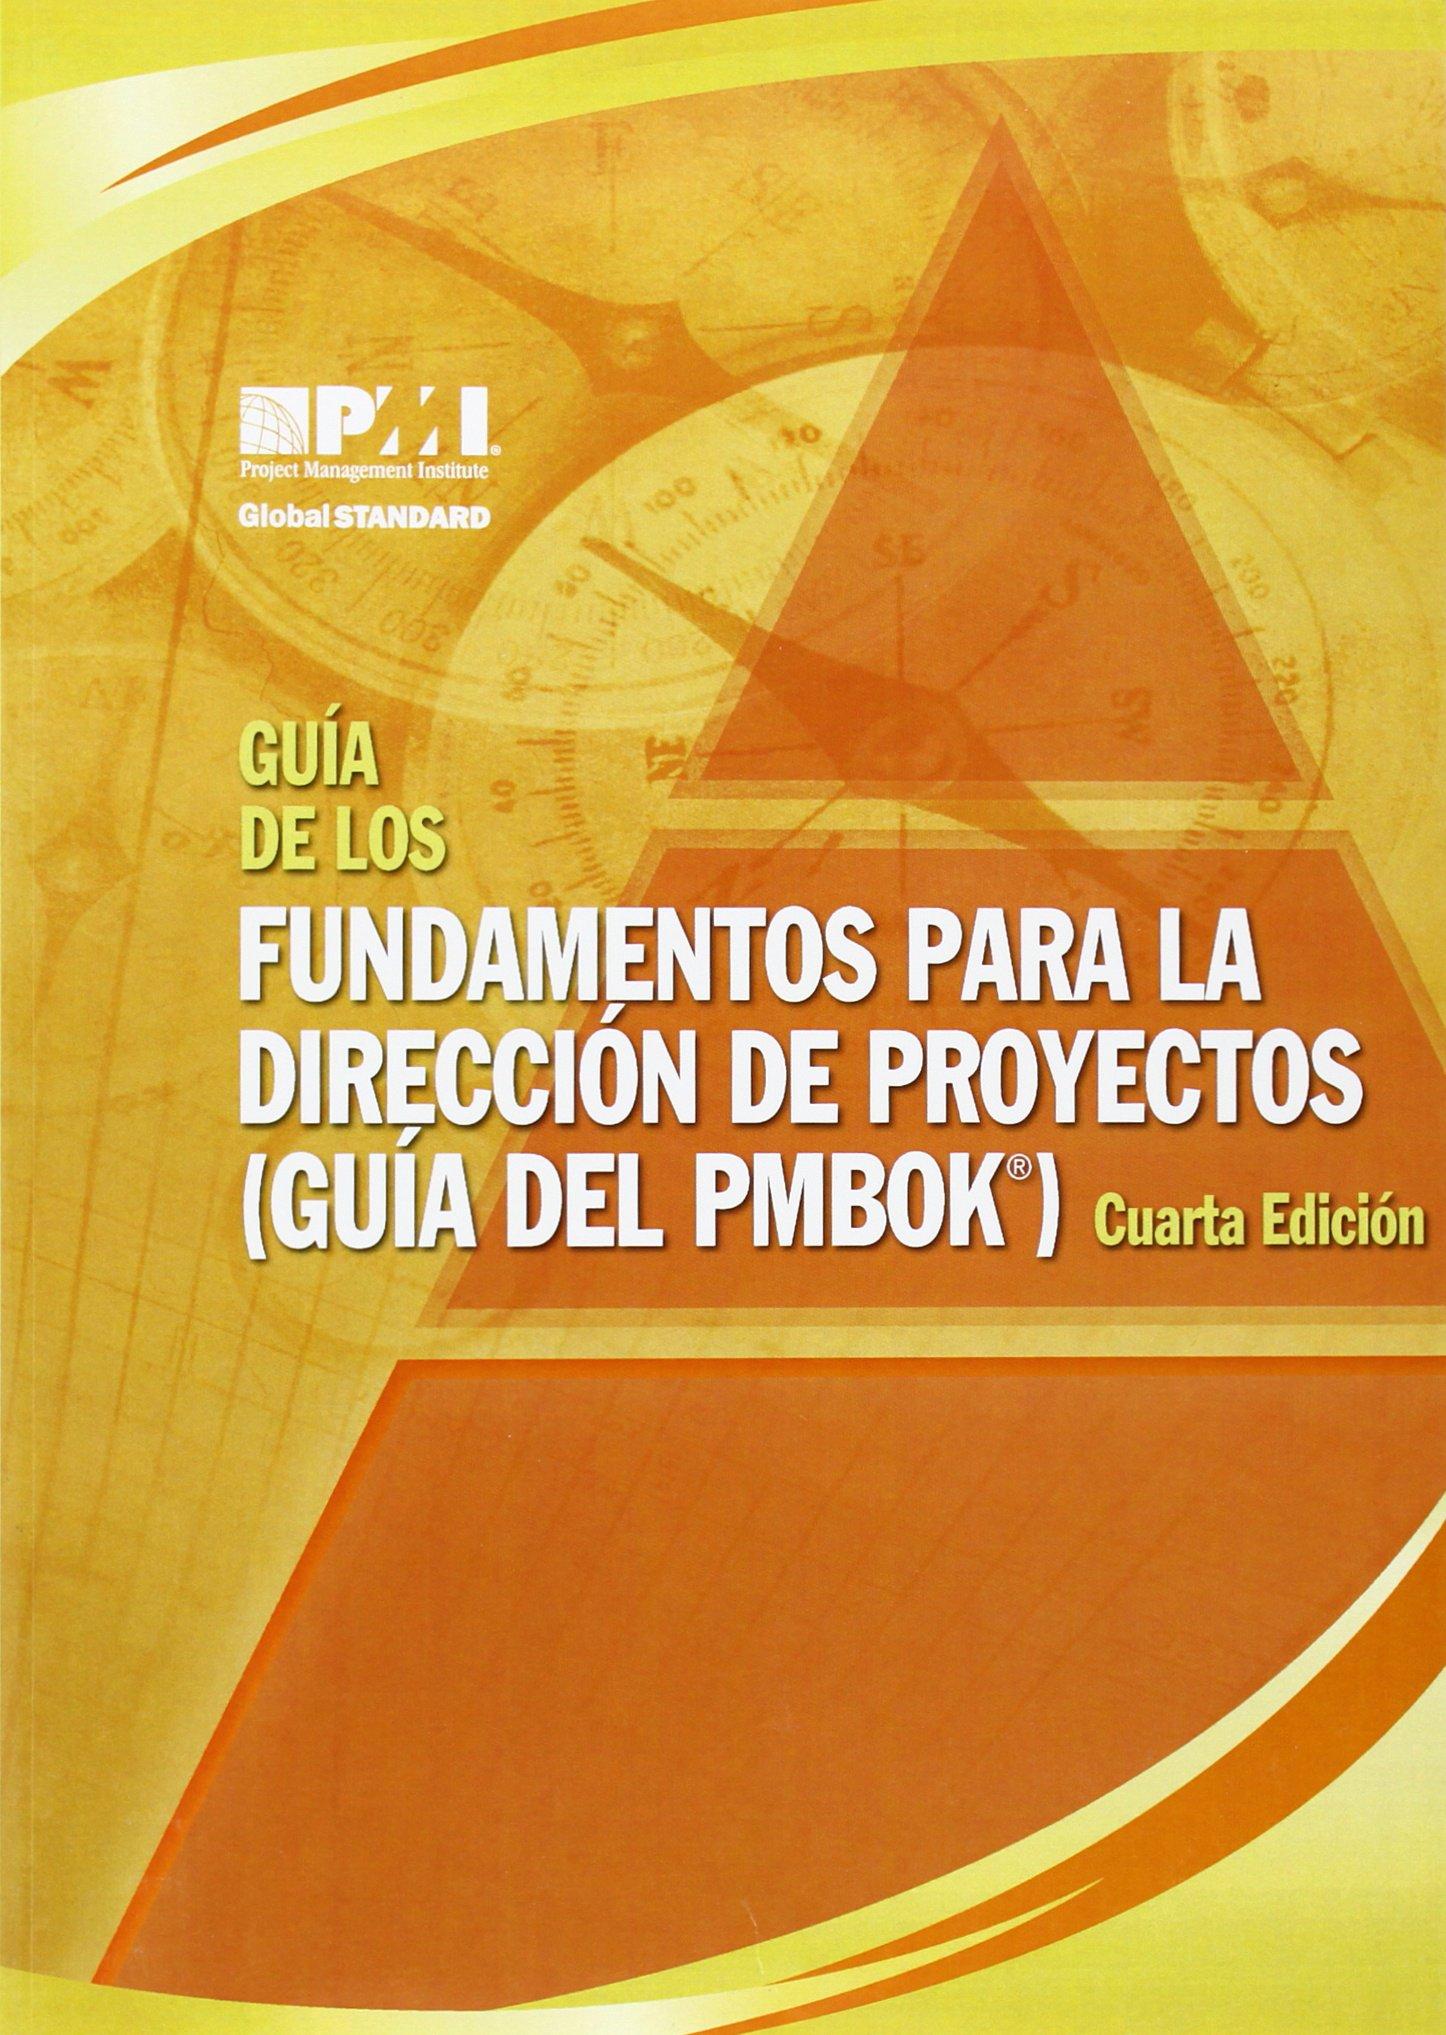 Pmbok 5th Edition Pdf Spanish